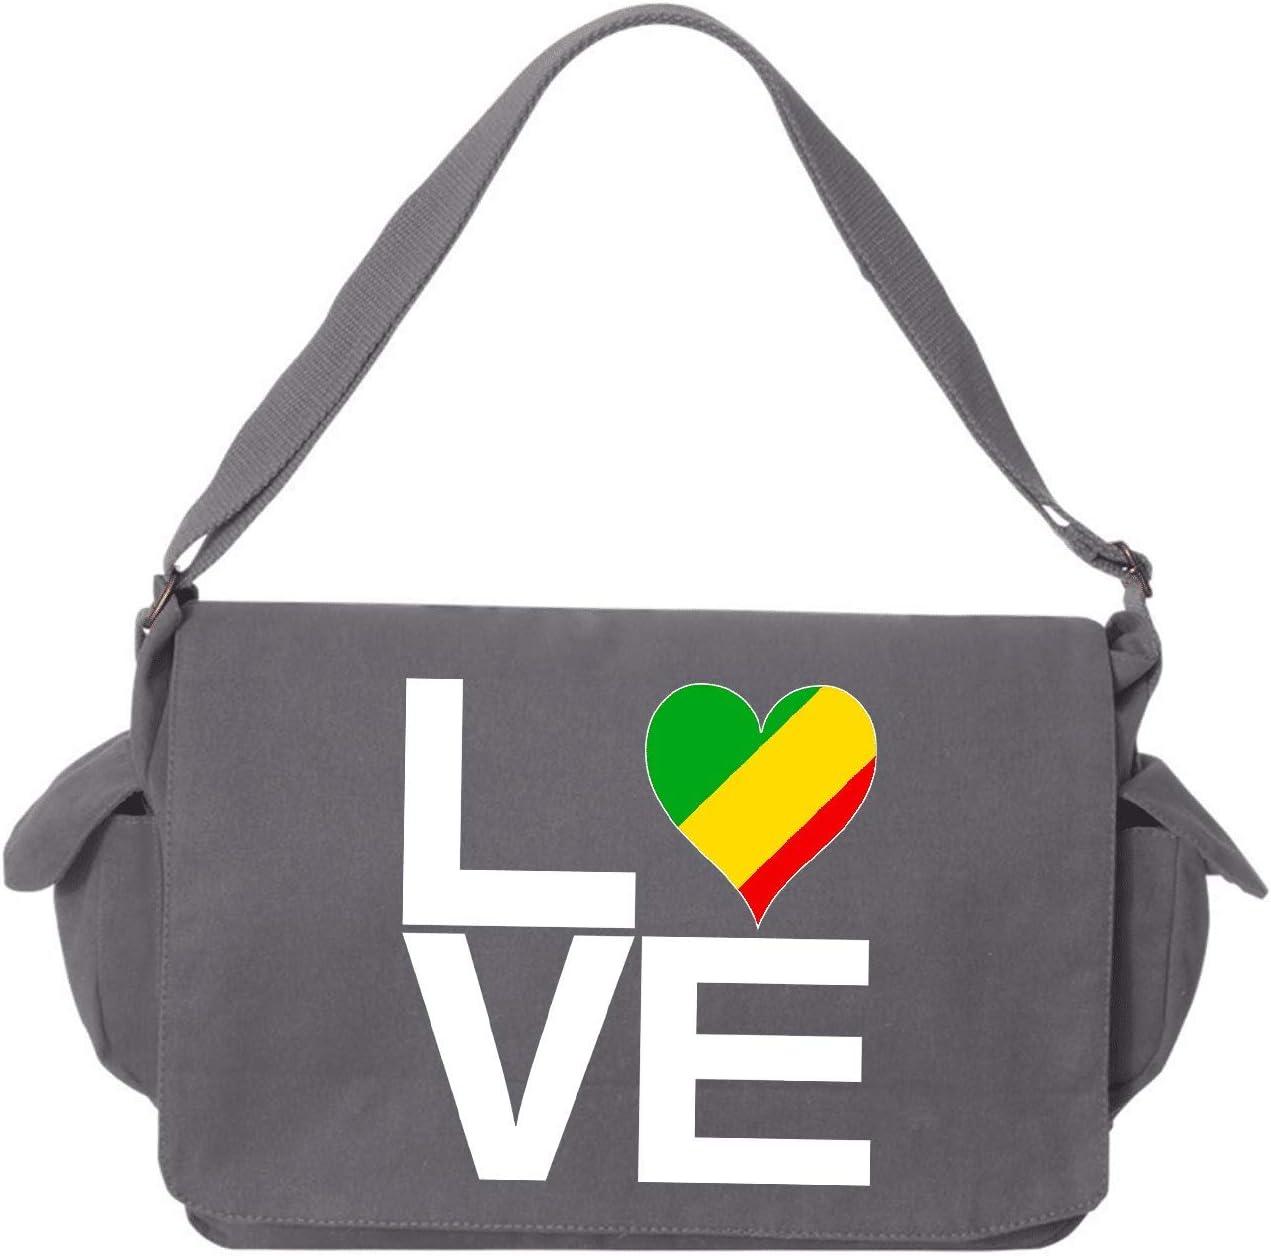 HARD EDGE DESIGN Love Block Congo Heart Bombing new work Printed Custom C Brushed Recommendation